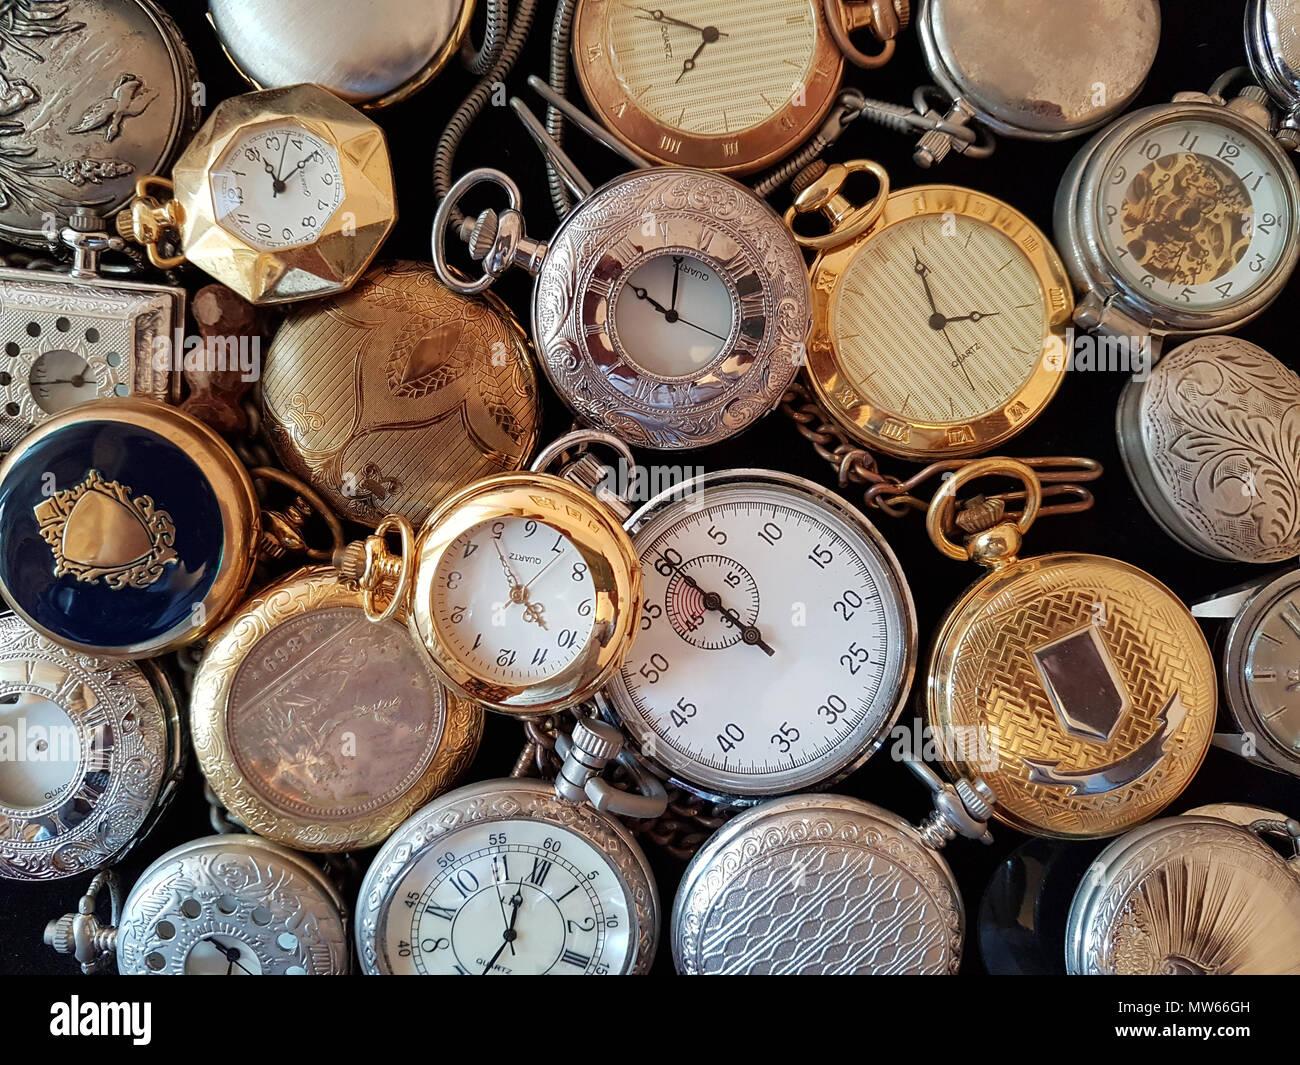 Many pocket watches - Stock Image